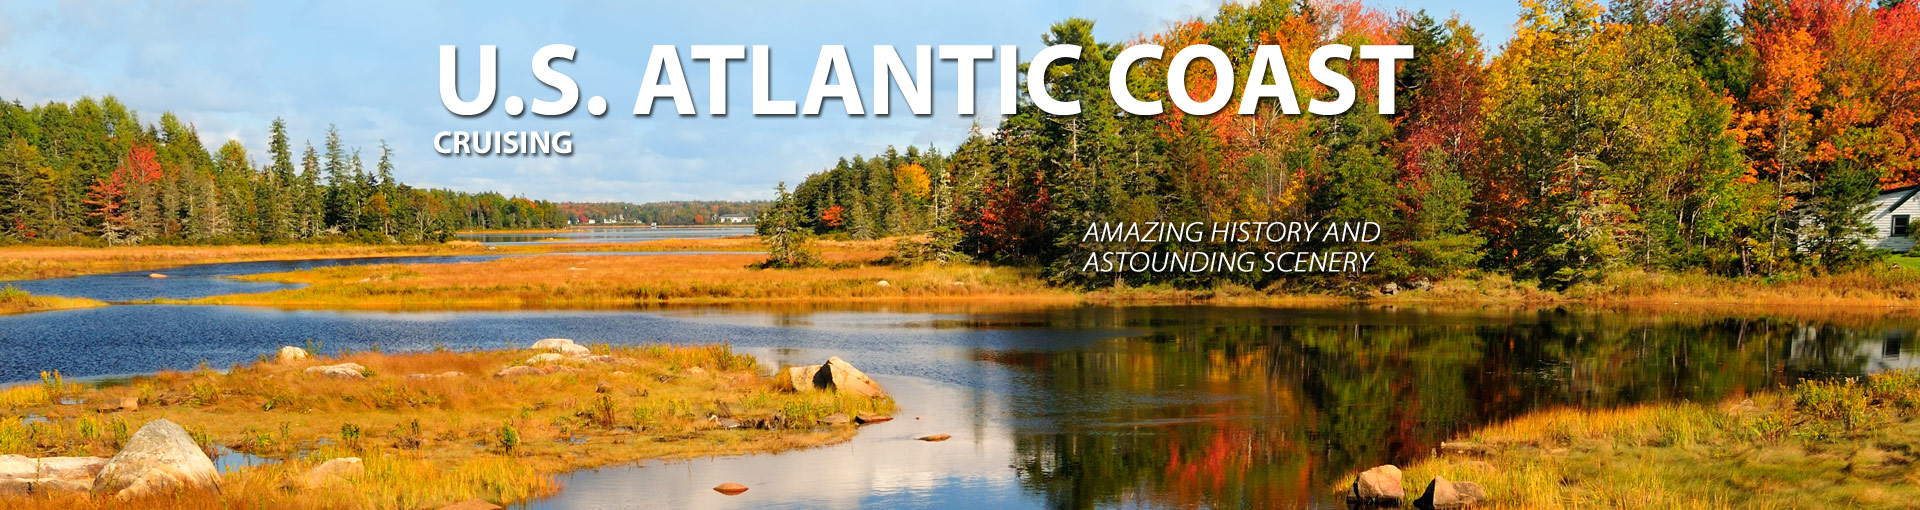 Cruises along U.S. Atlantic Coast